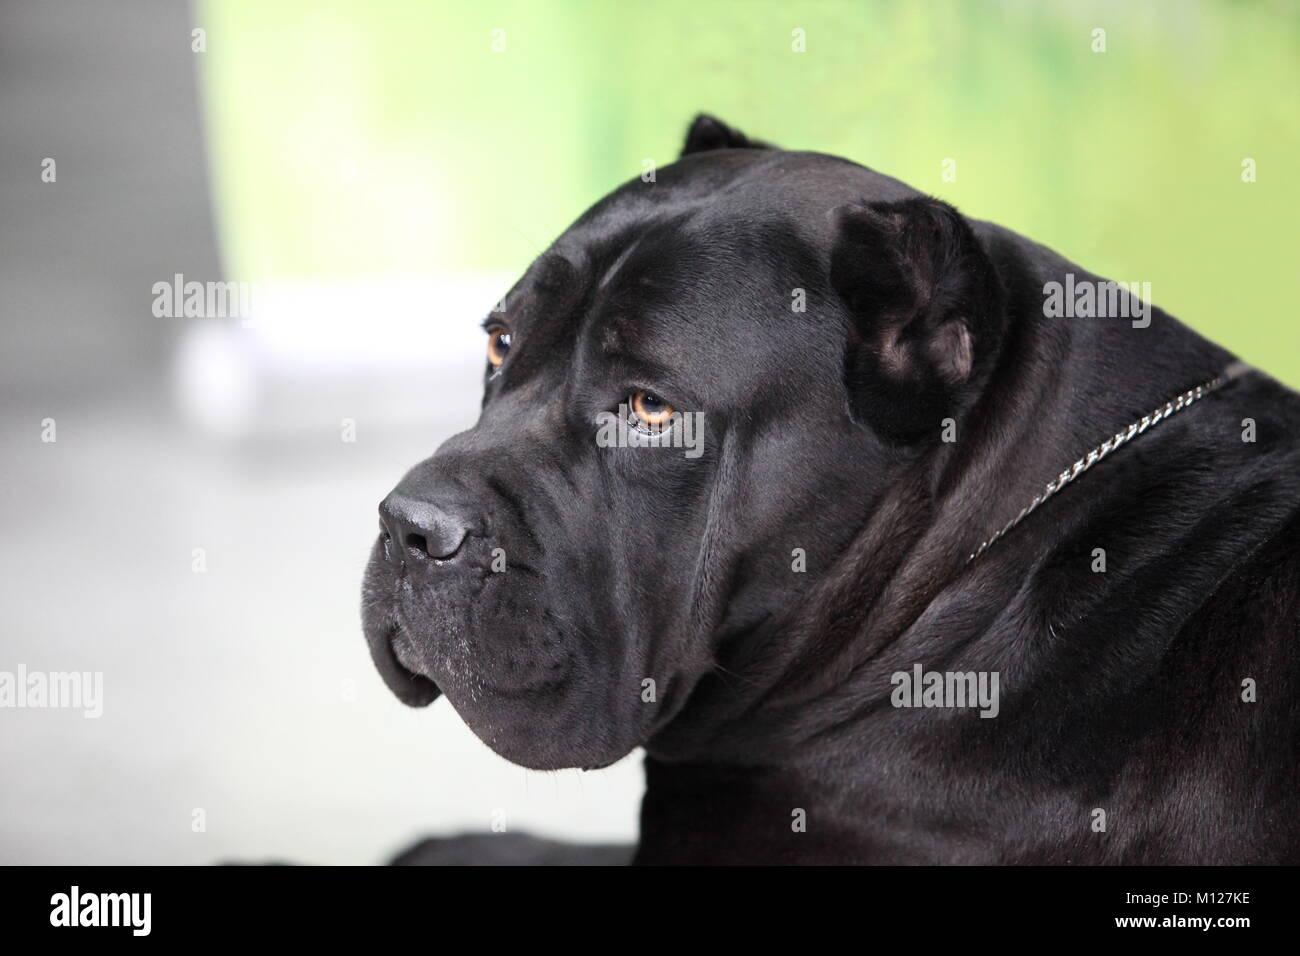 Watchdog Stock Photos & Watchdog Stock Images - Alamy